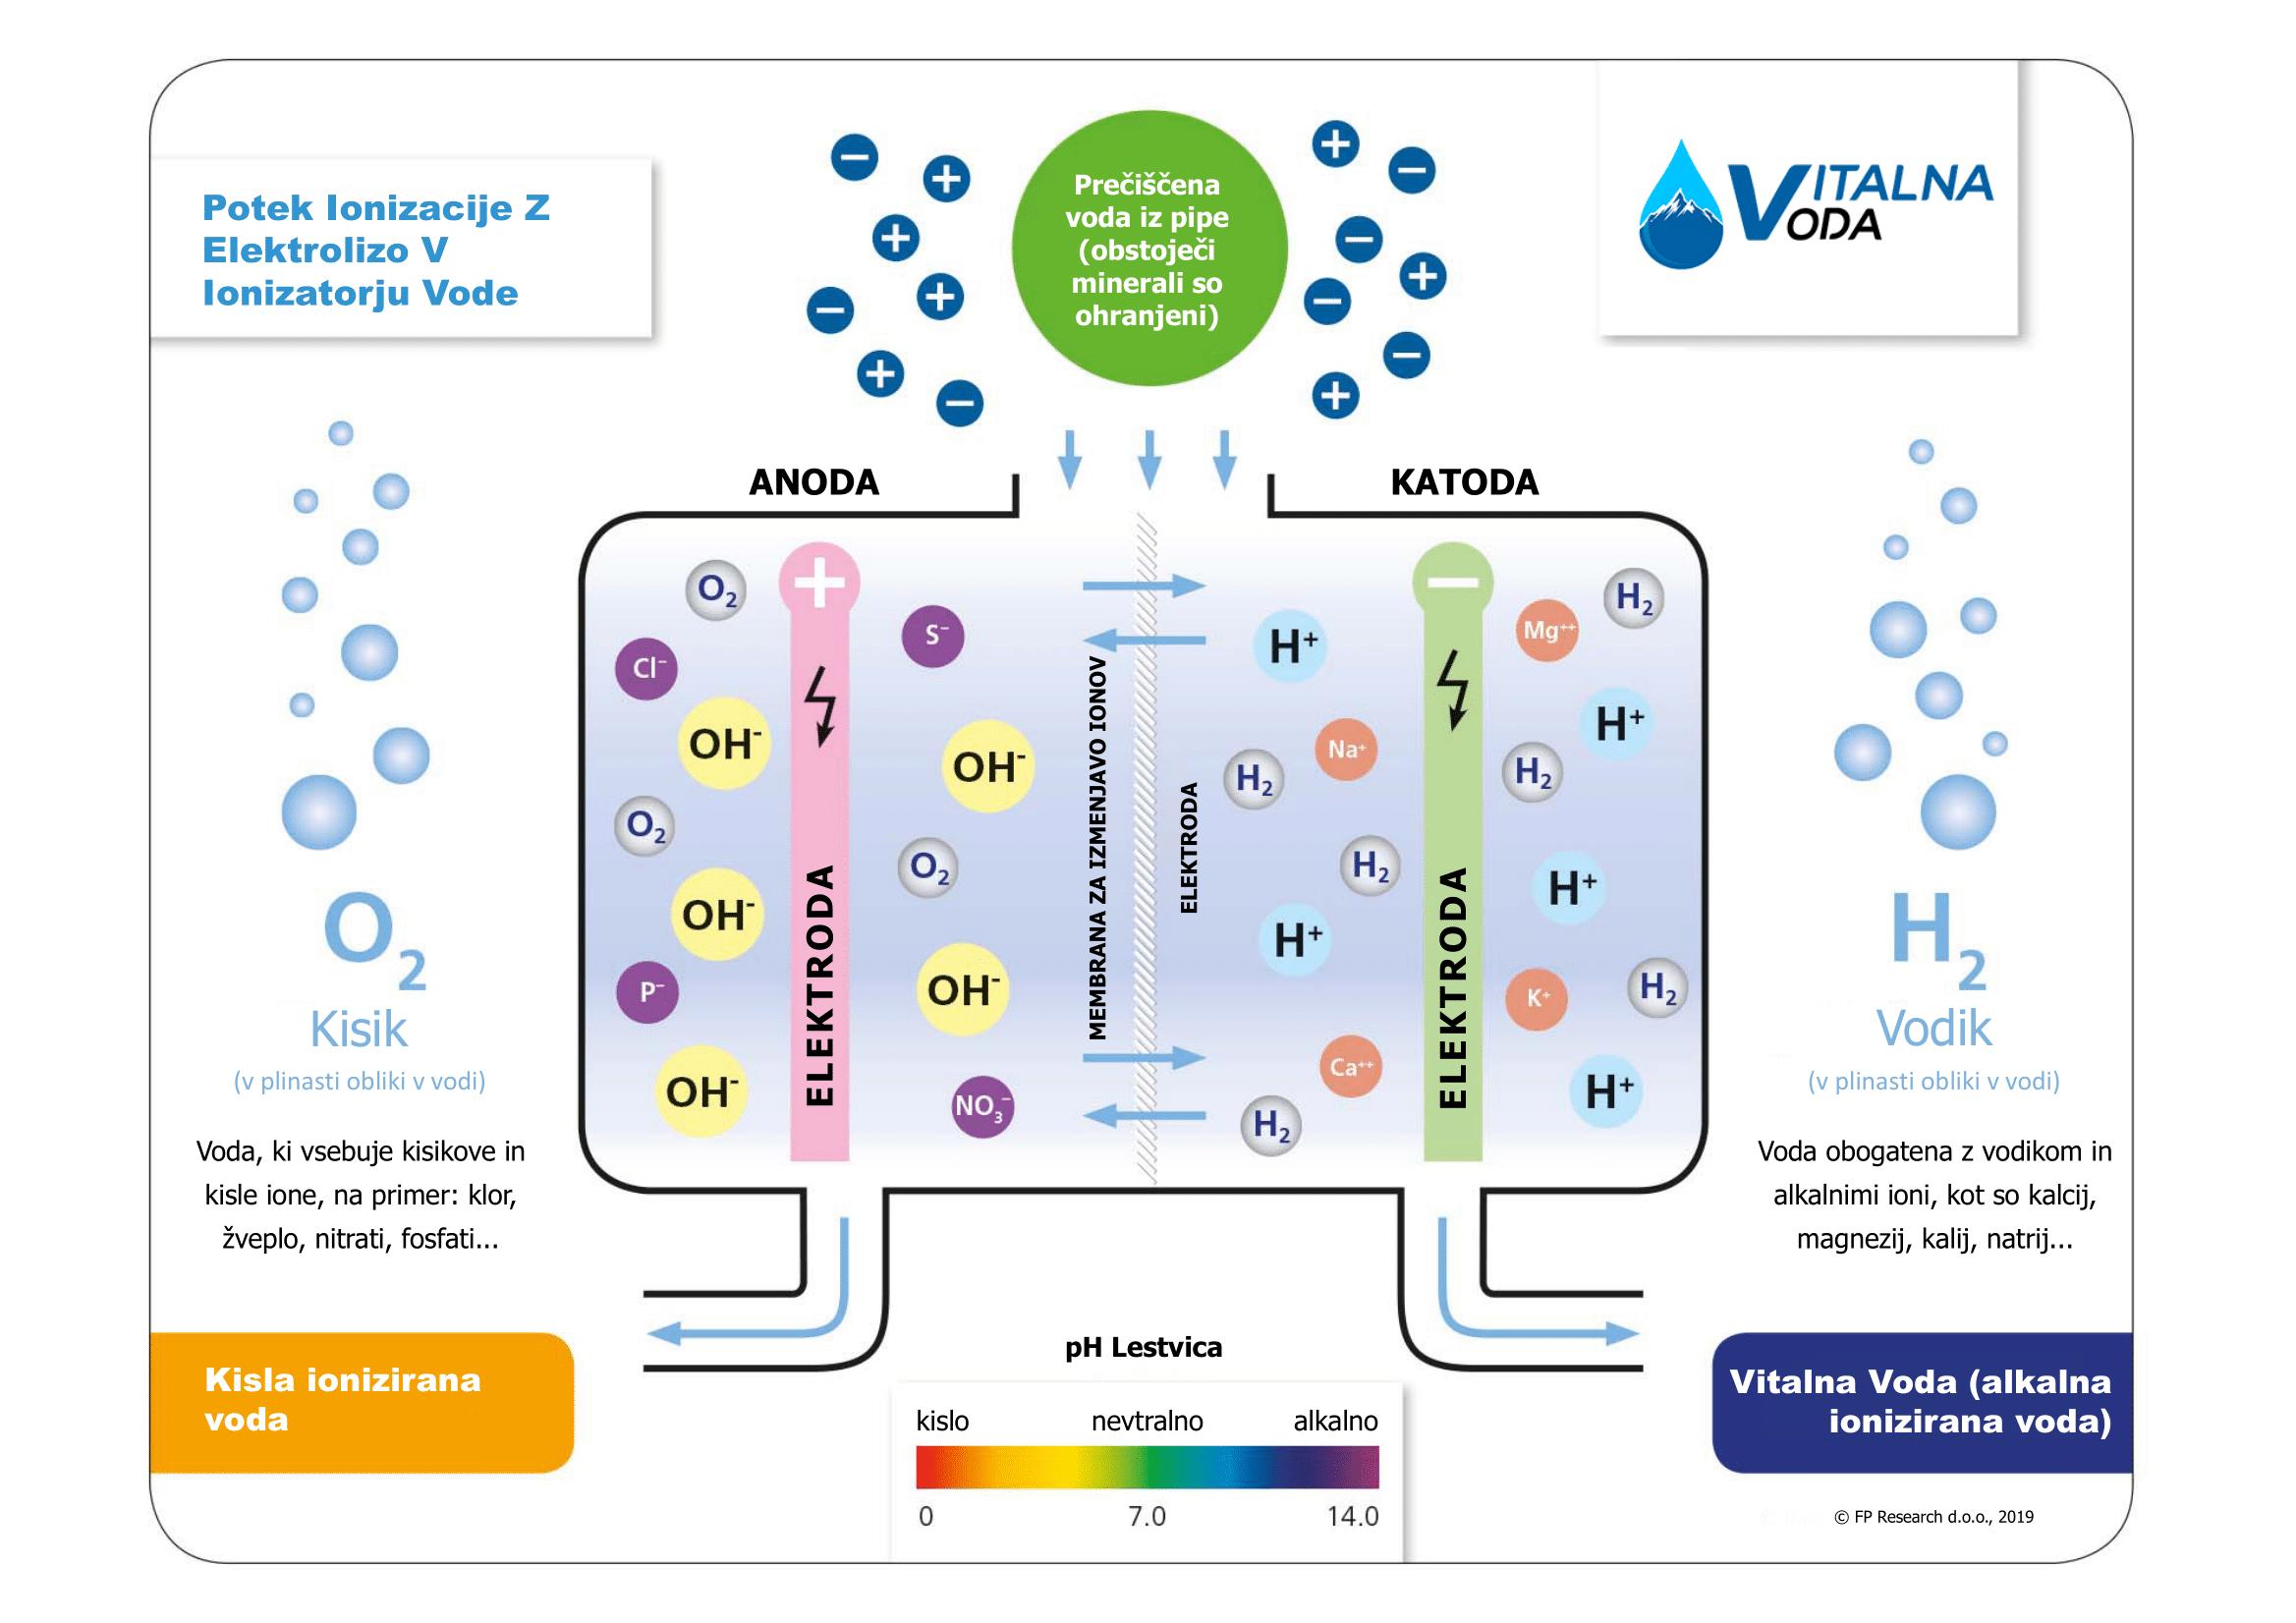 Proces ionizacije z elektrolizo